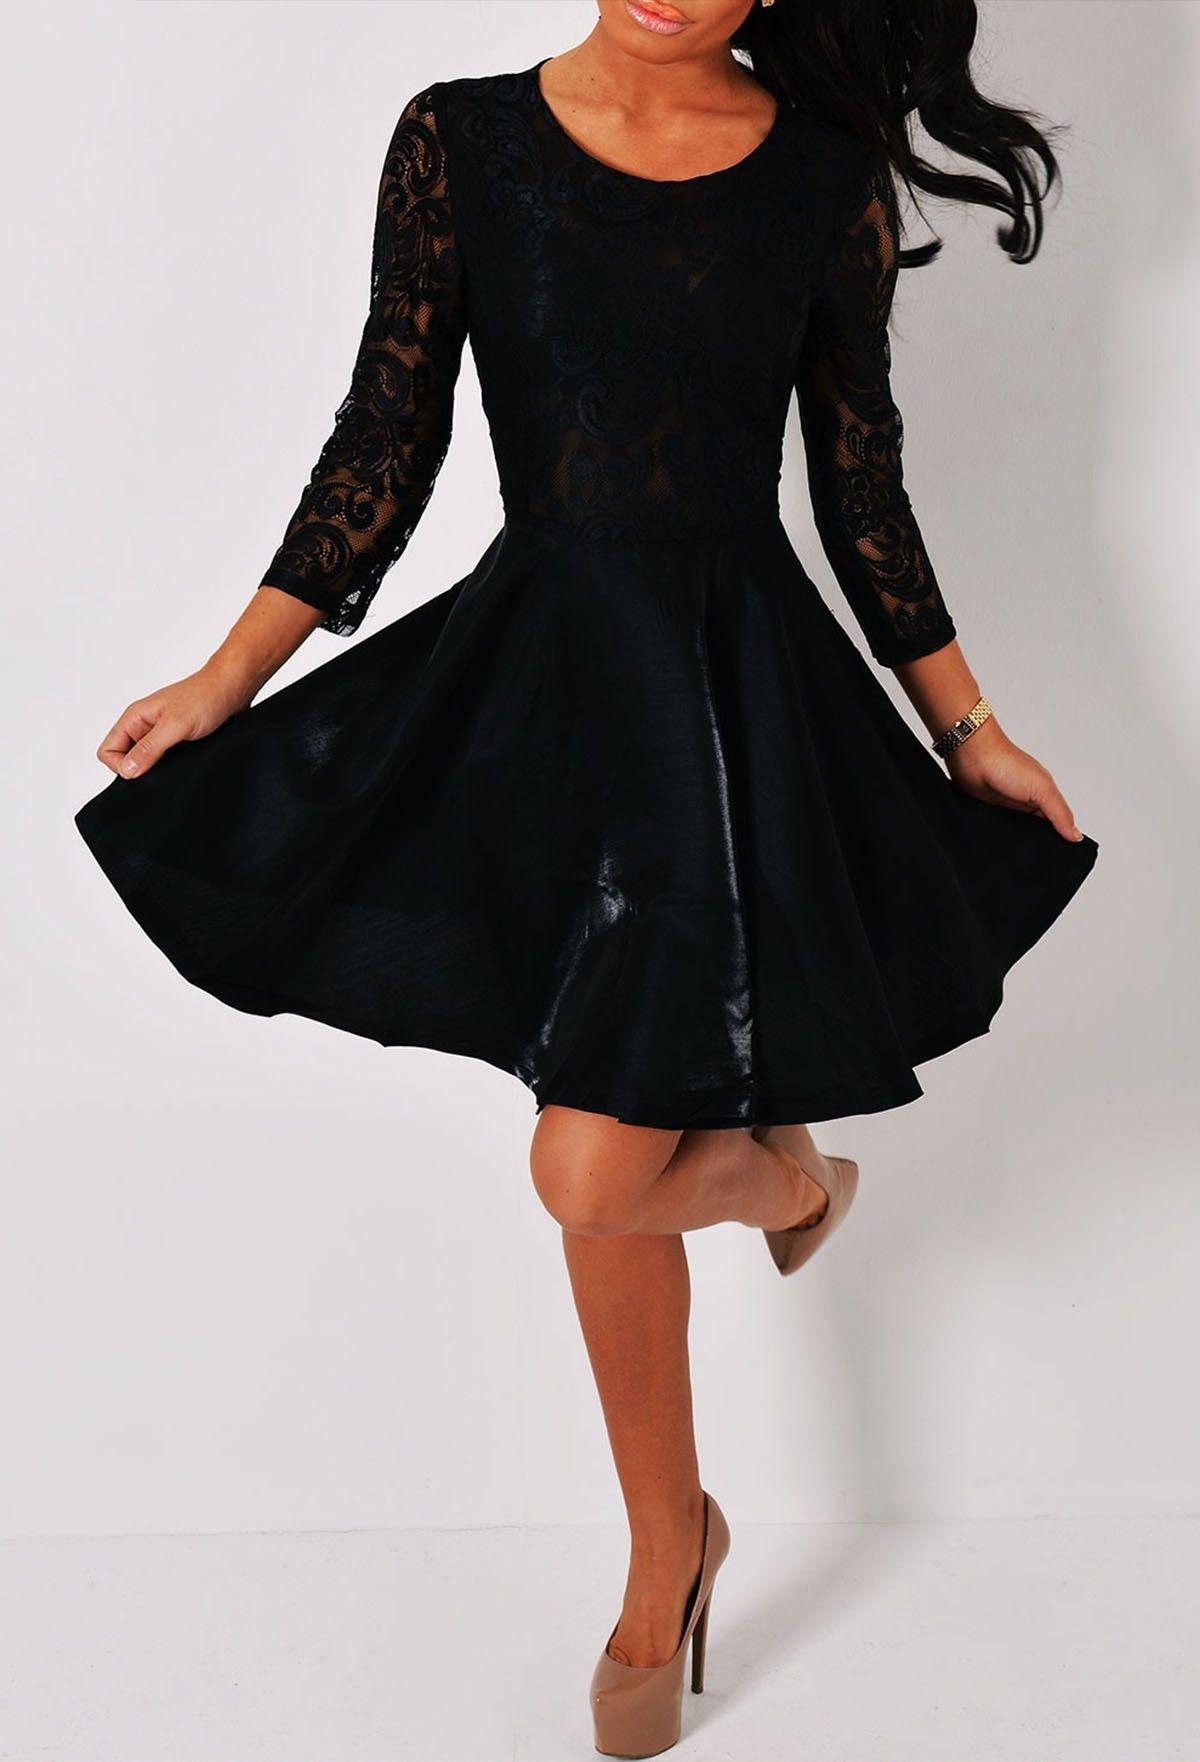 best ideas about black skater dresses on pinterest moto style